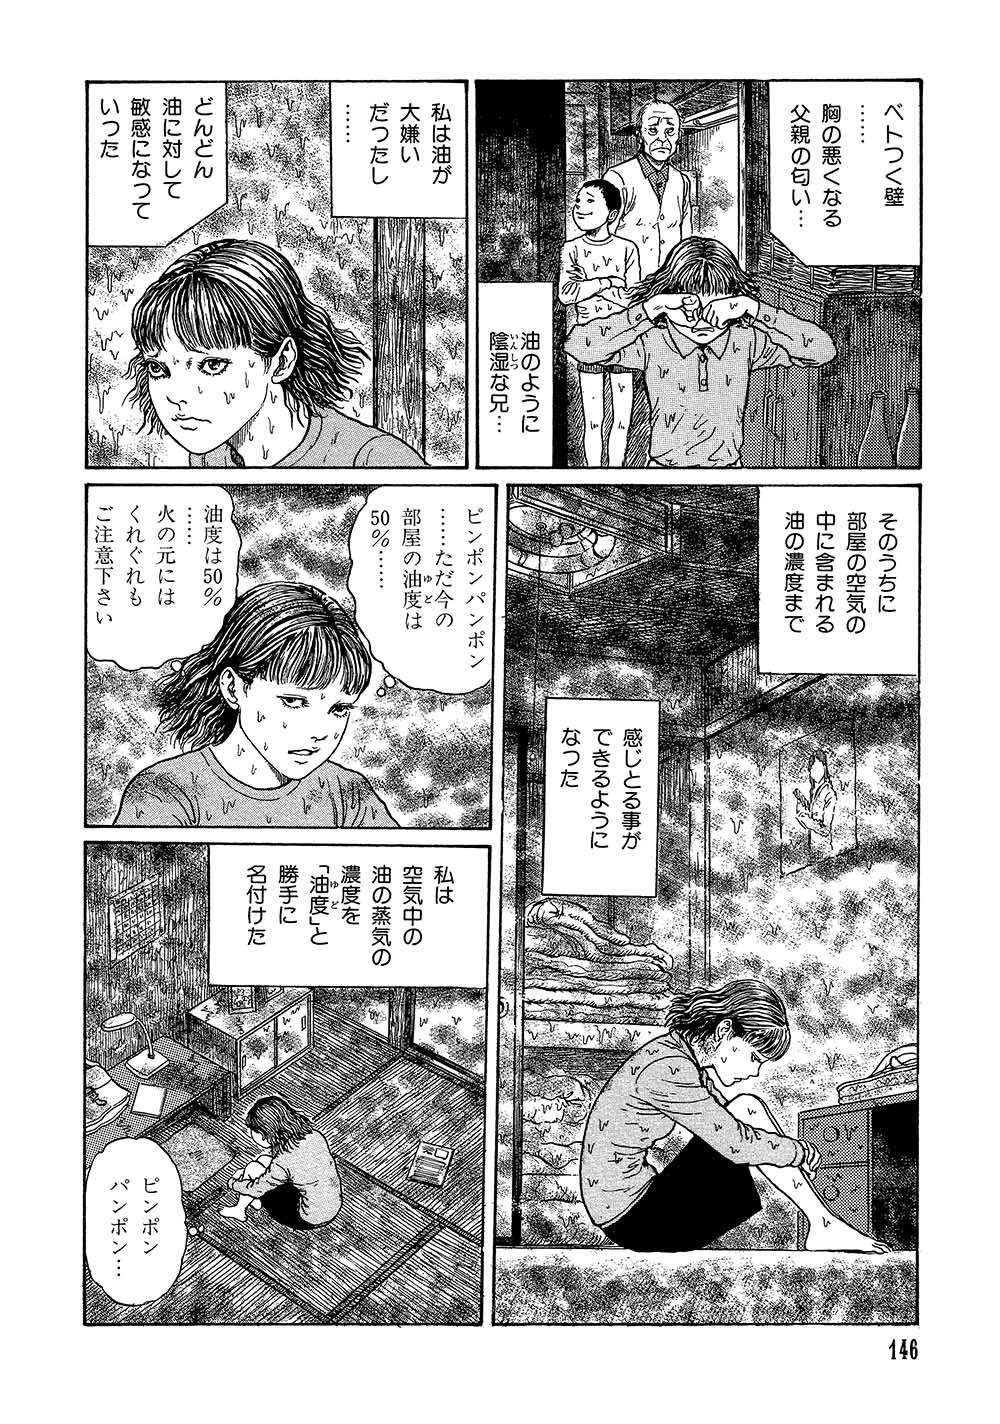 yami_0001_0146.jpg